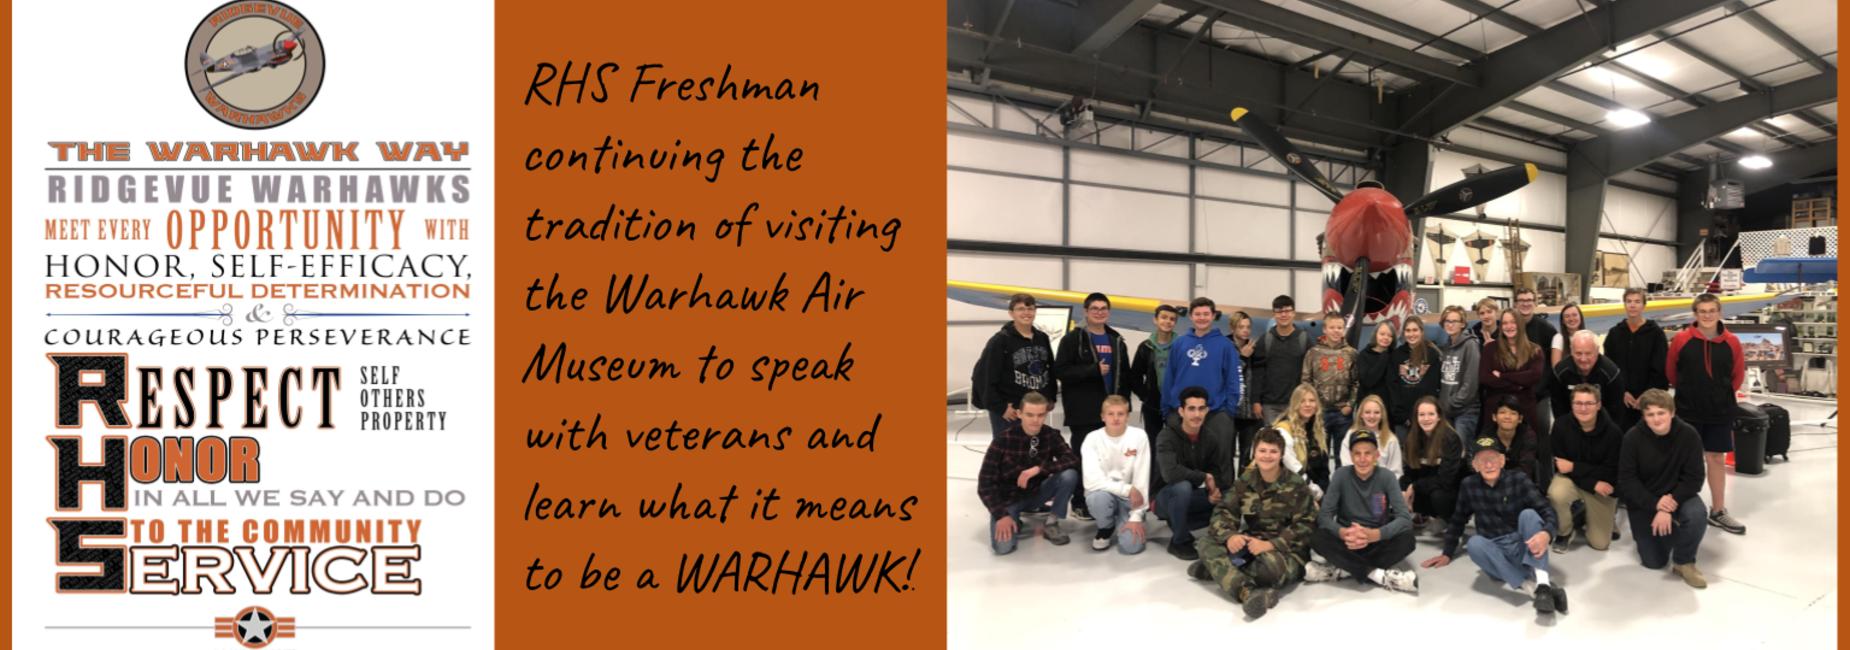 RHS Freshman attending Warhawk Air museum field trip.